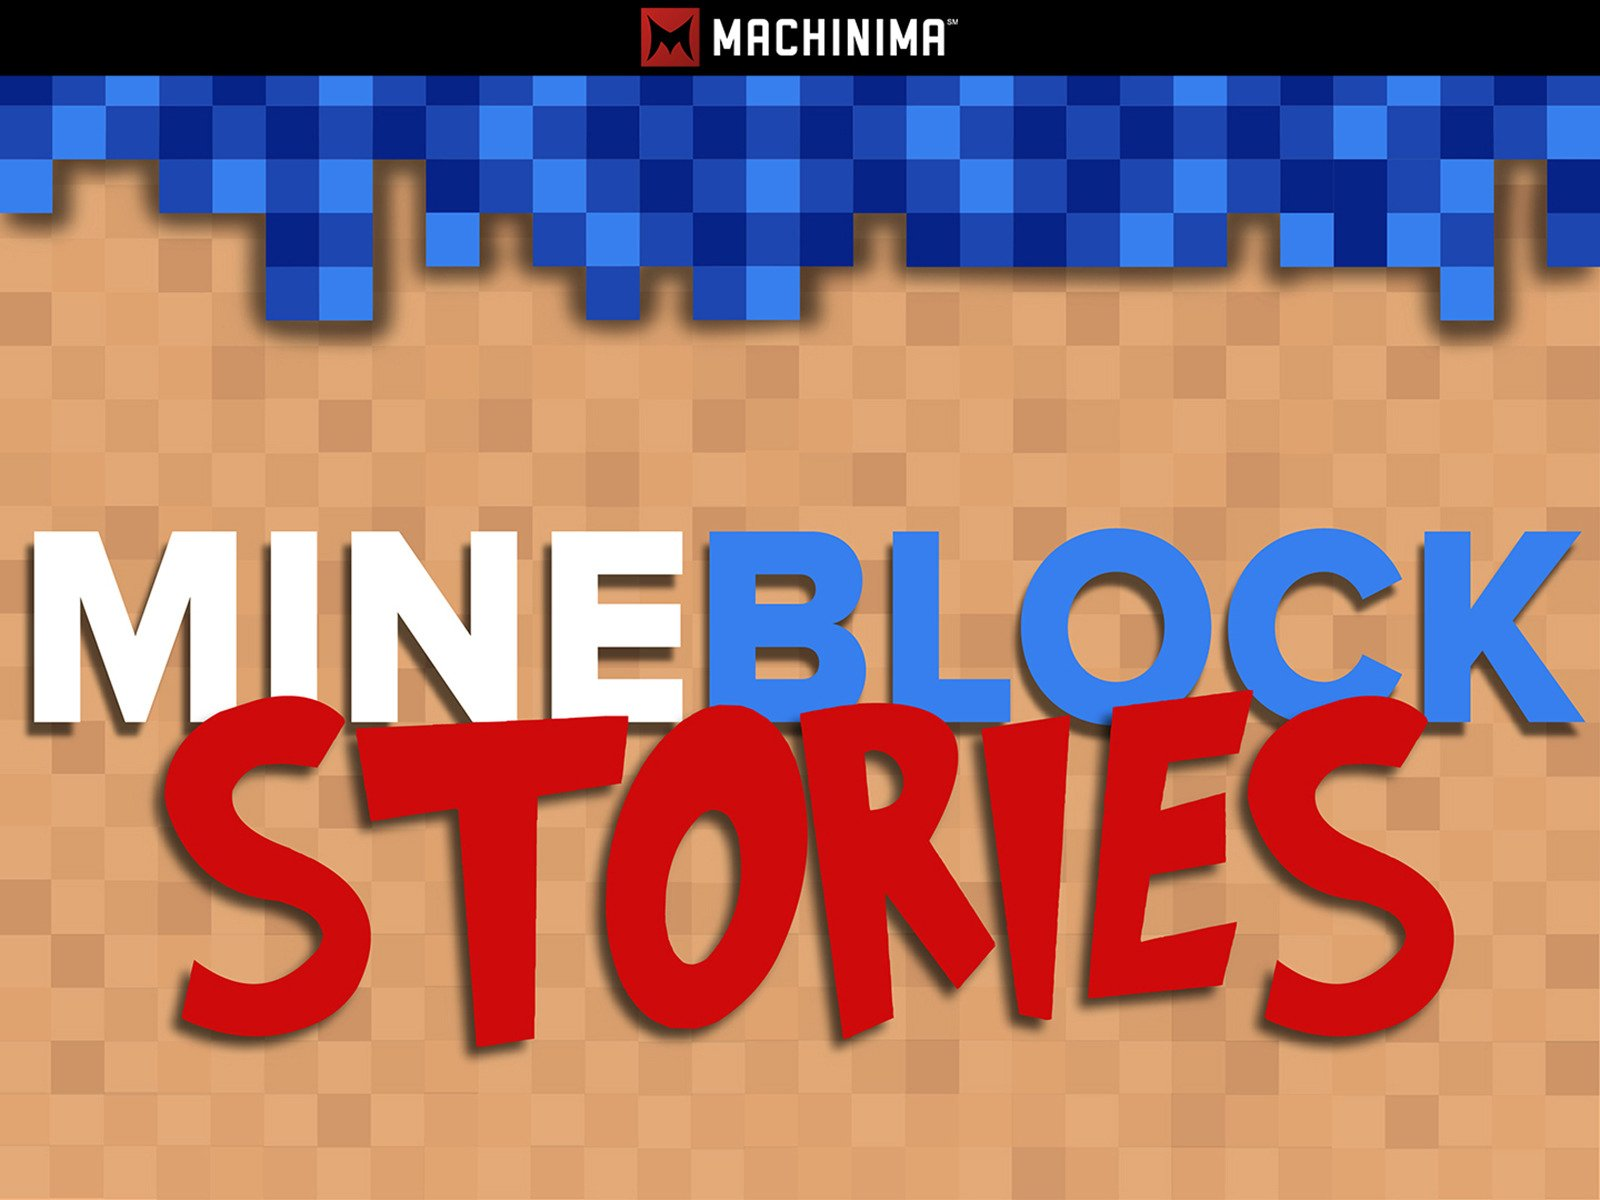 Mineblock:Stories